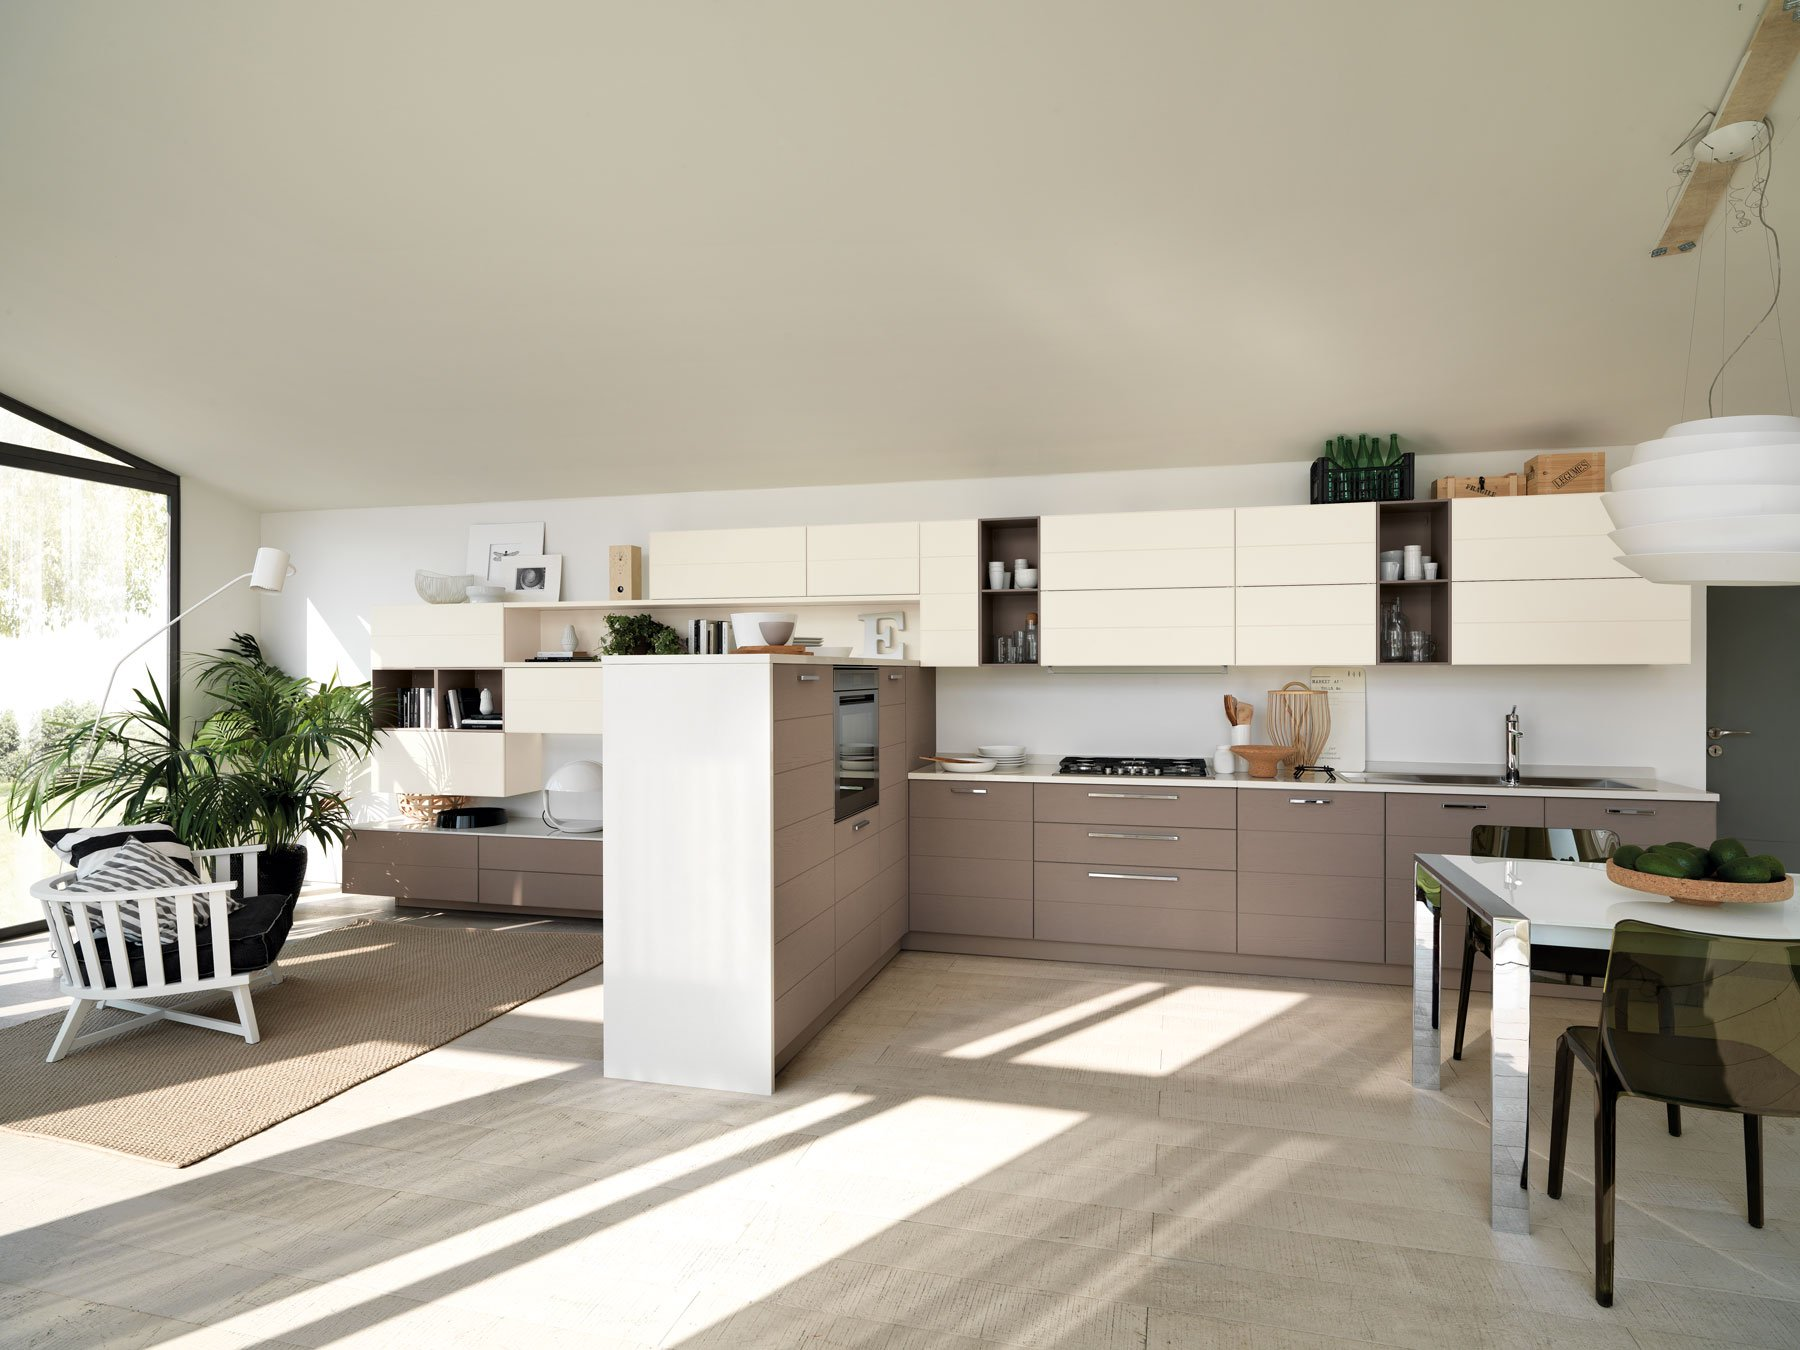 Casabook immobiliare cucina e soggiorno un unico ambiente - Cucina ambiente unico ...